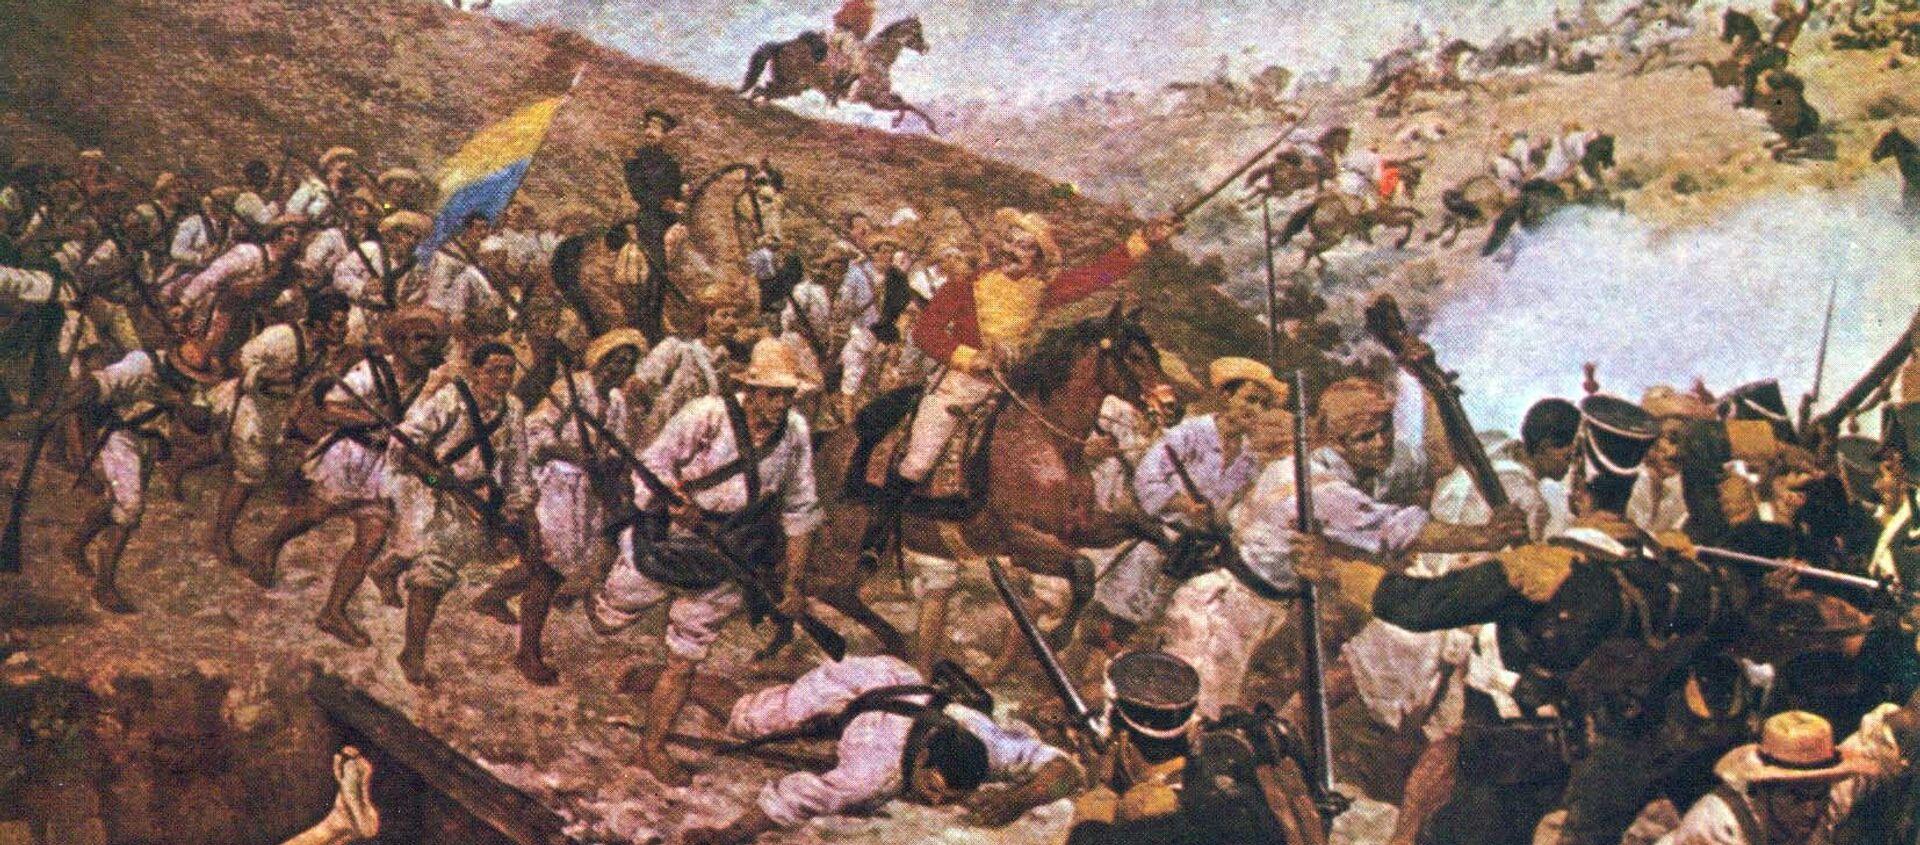 Batalla de Boyacá - Sputnik Mundo, 1920, 06.08.2020